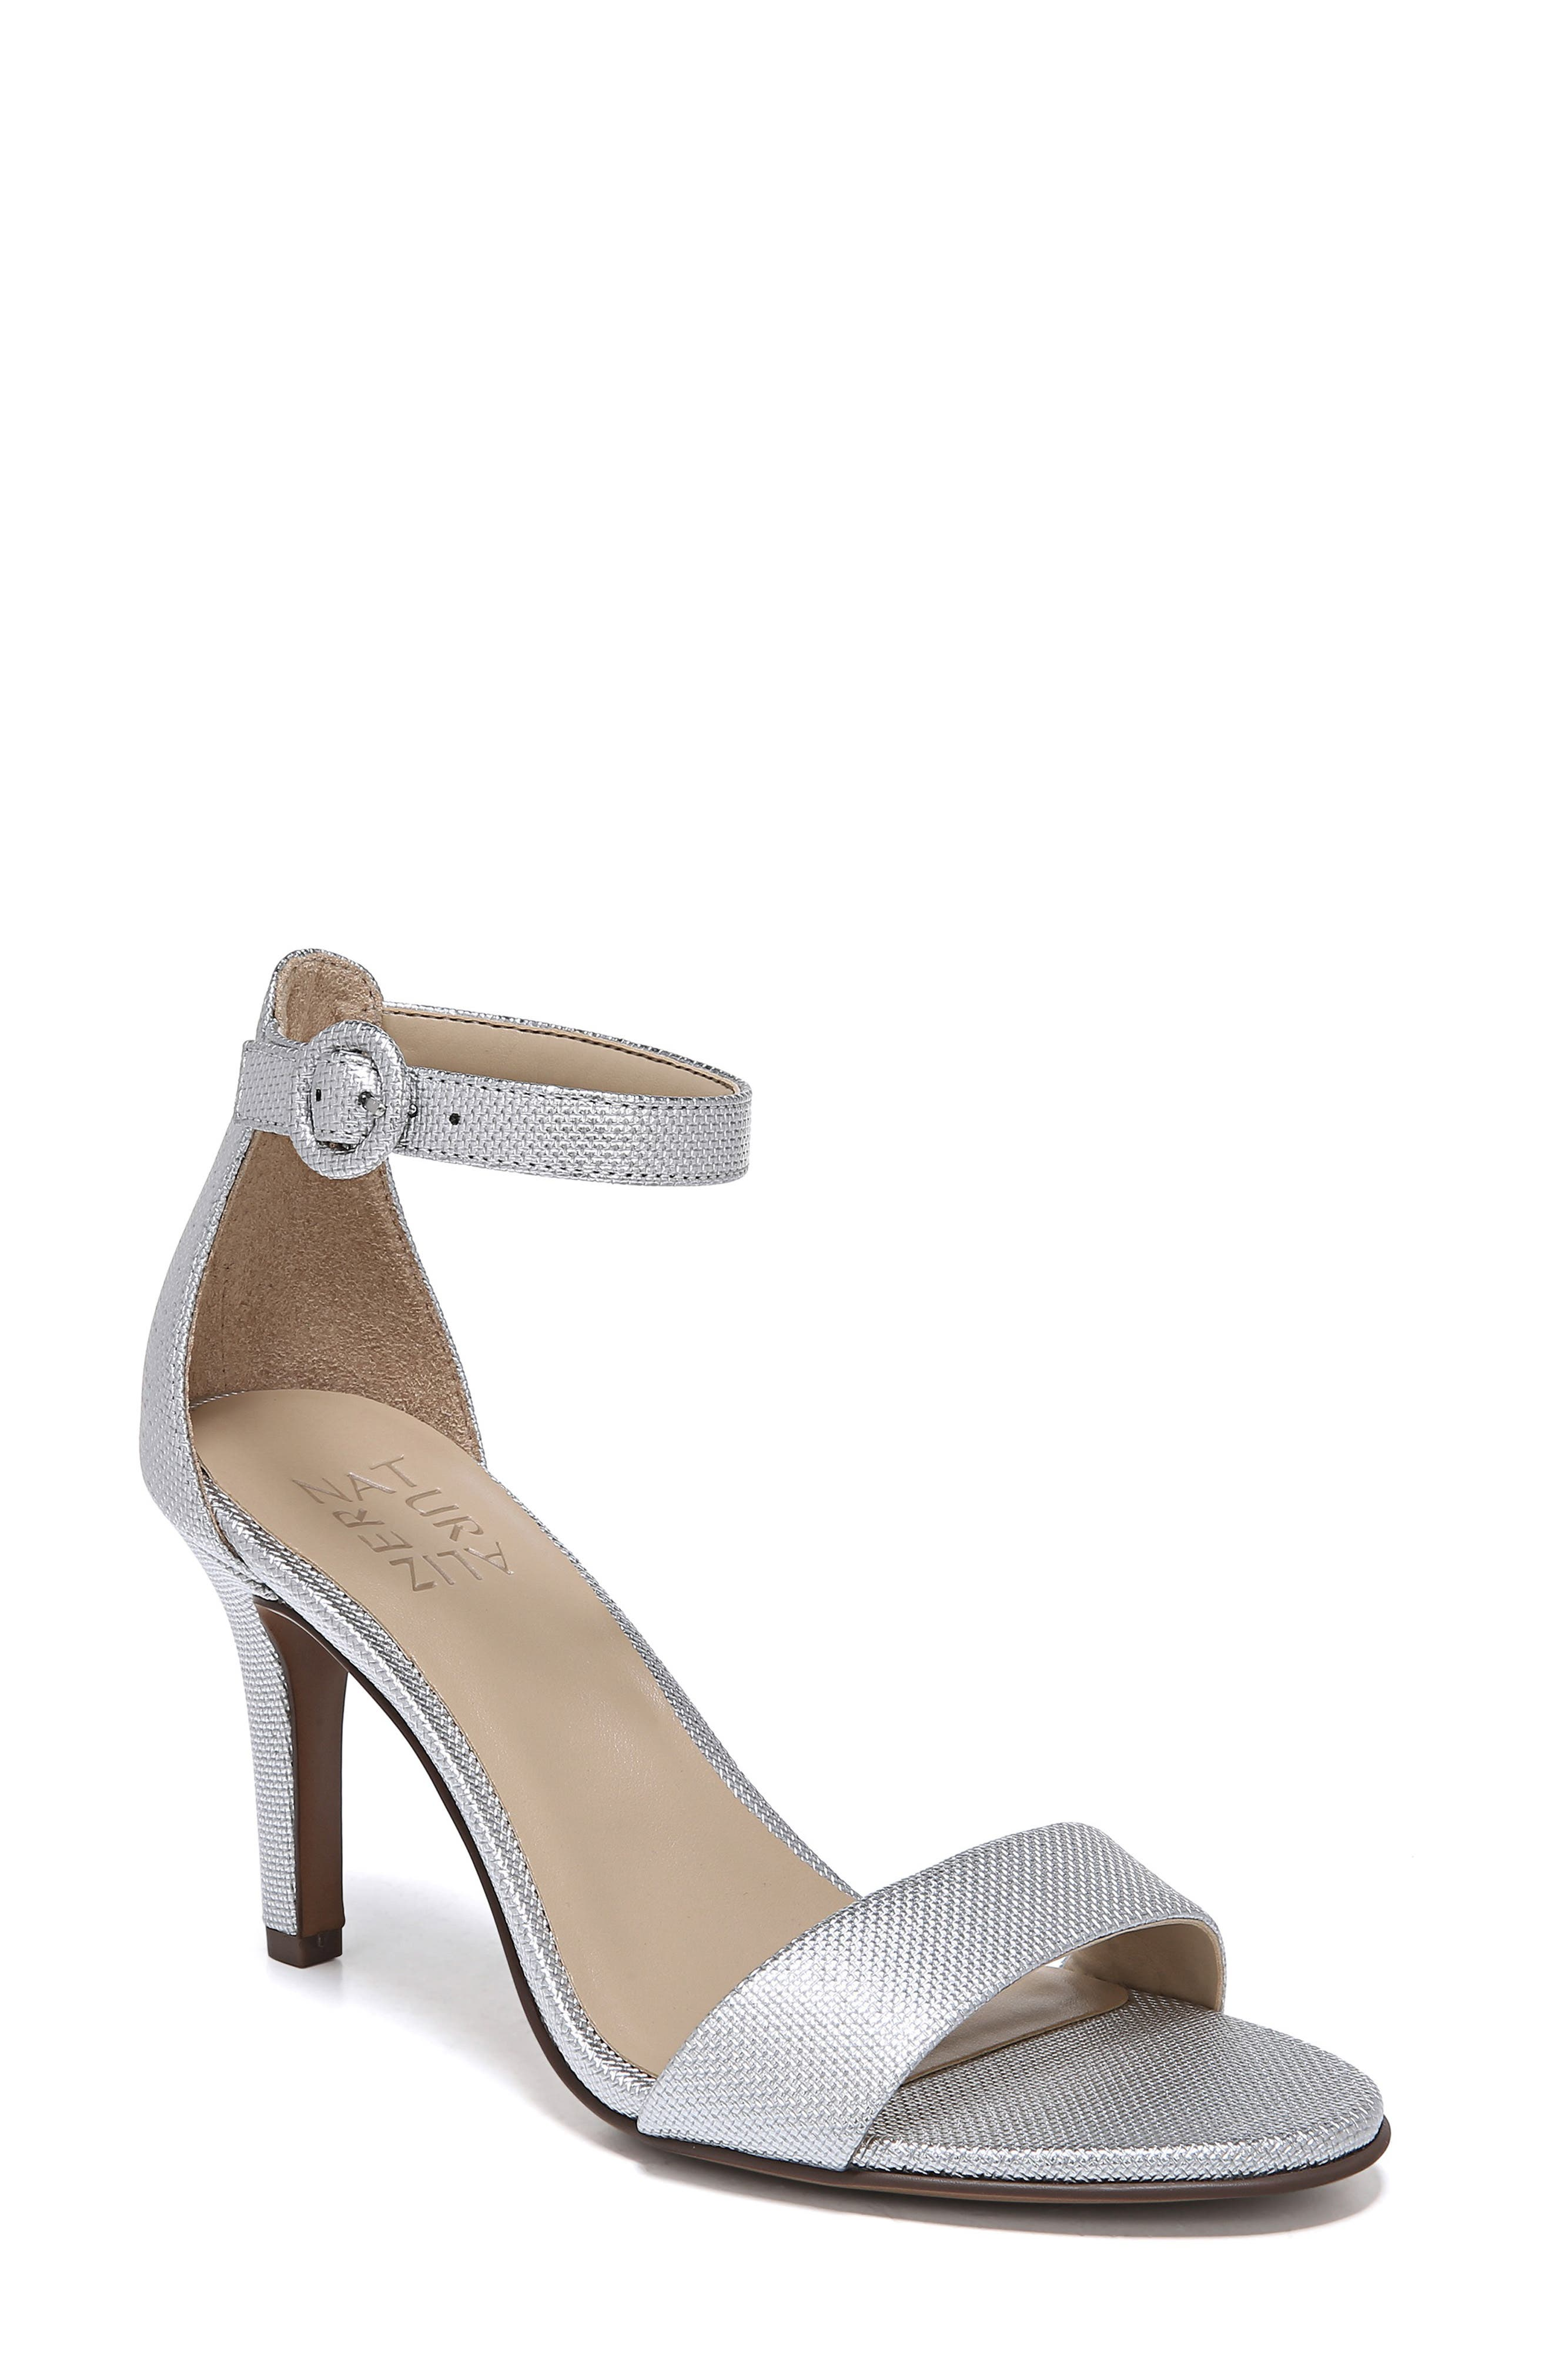 Kinsley Ankle Strap Sandal, Main, color, SILVER